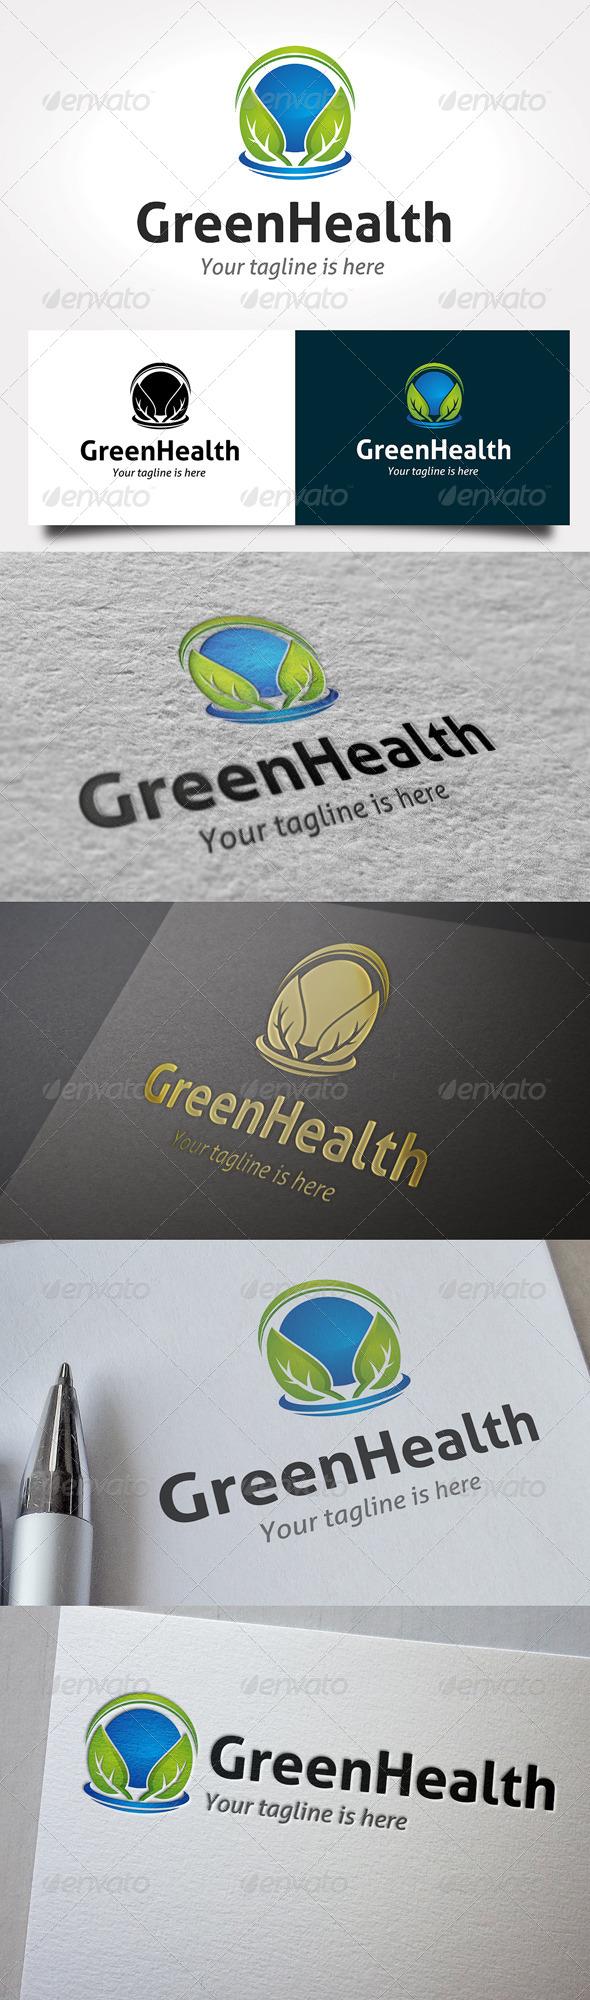 GraphicRiver Green Health Logo 6477236